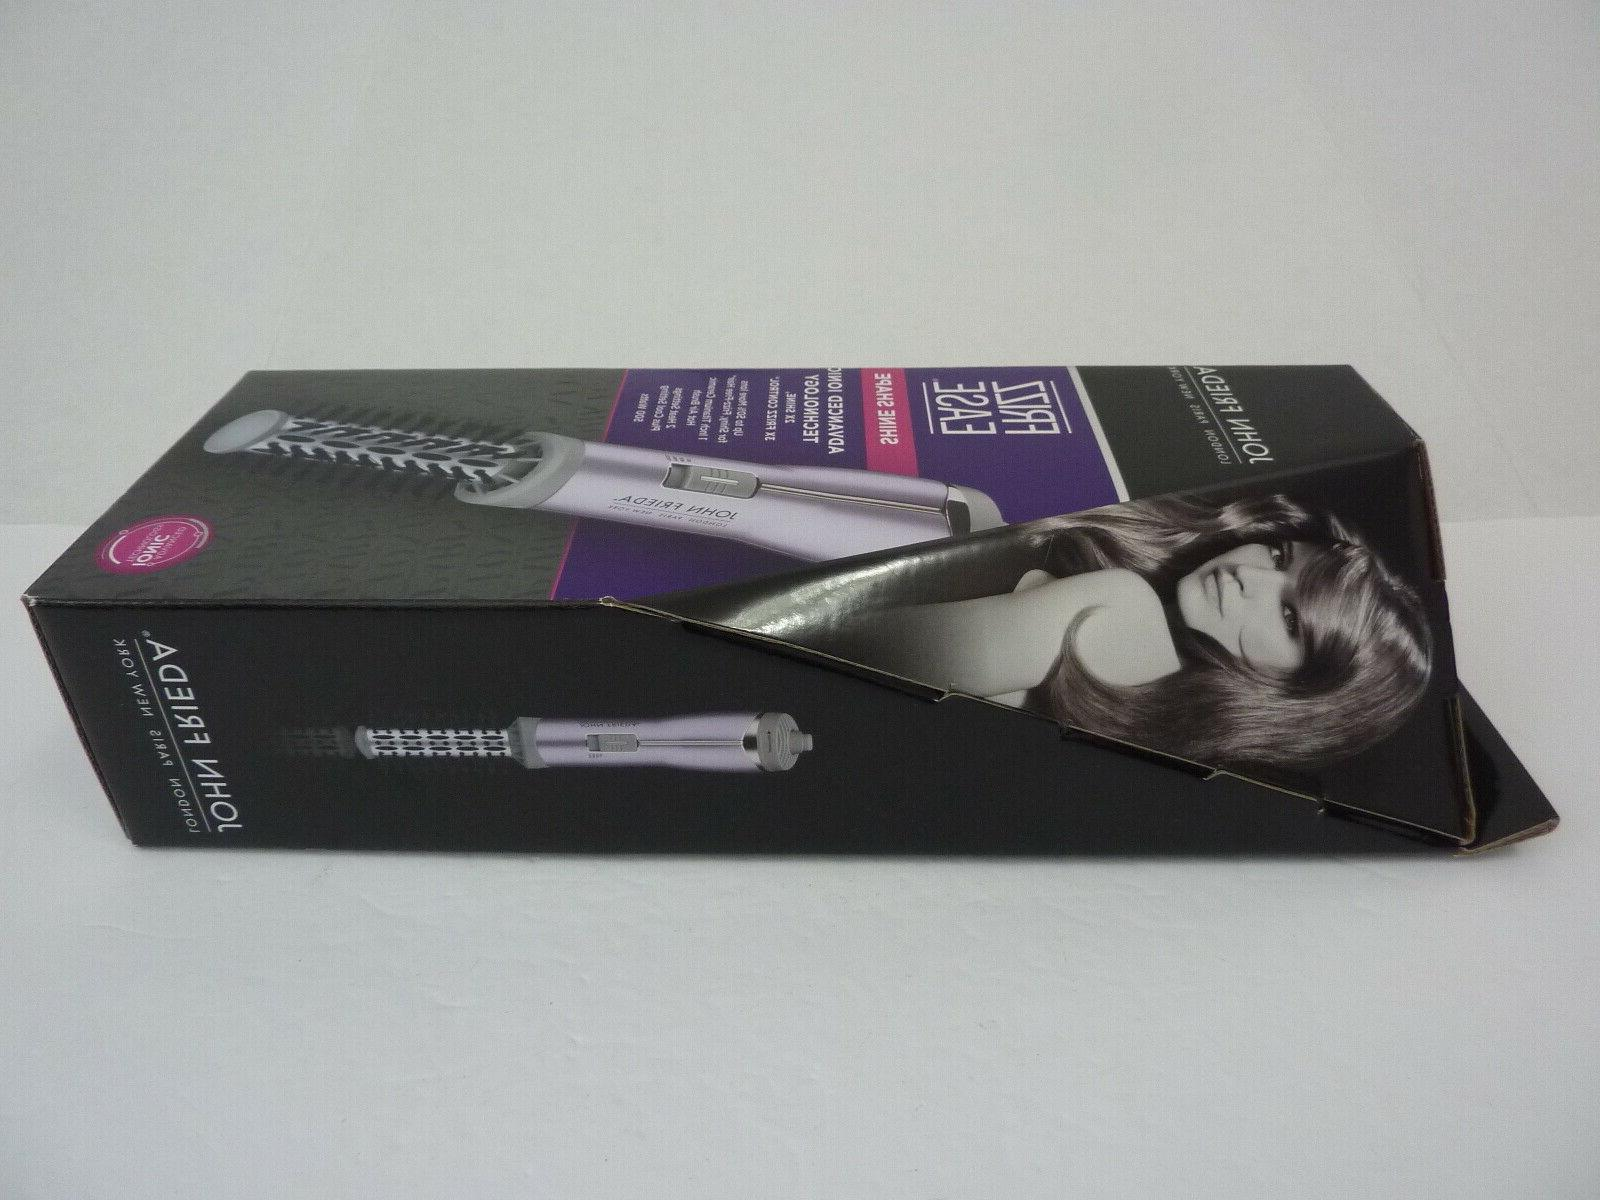 NEW - Frizz Ease Shine Shape 1-inch Hot Air Brush JFHA6NG